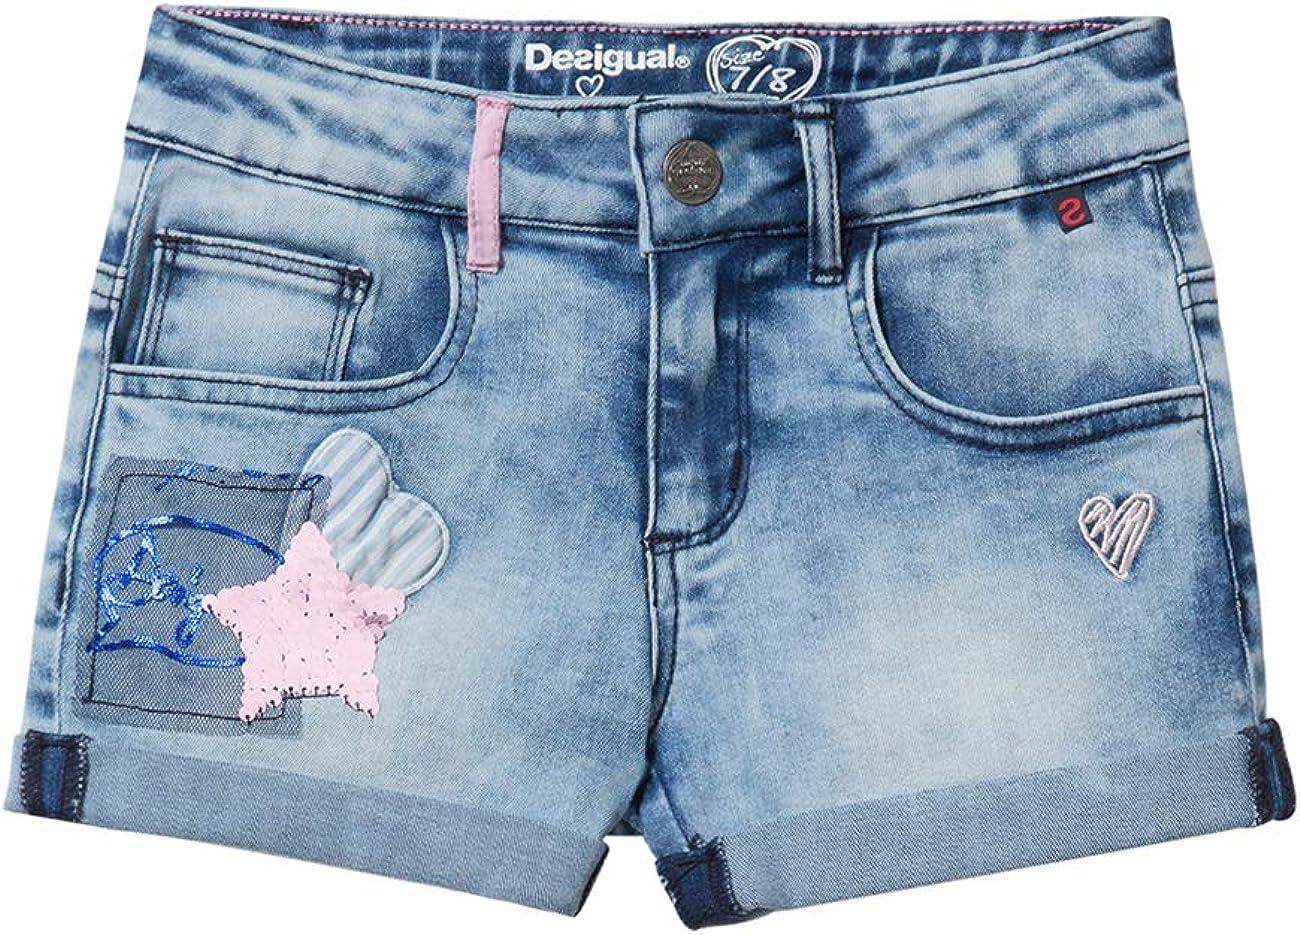 Desigual Denim Patch Shorts Maestre Pantalones Cortos para